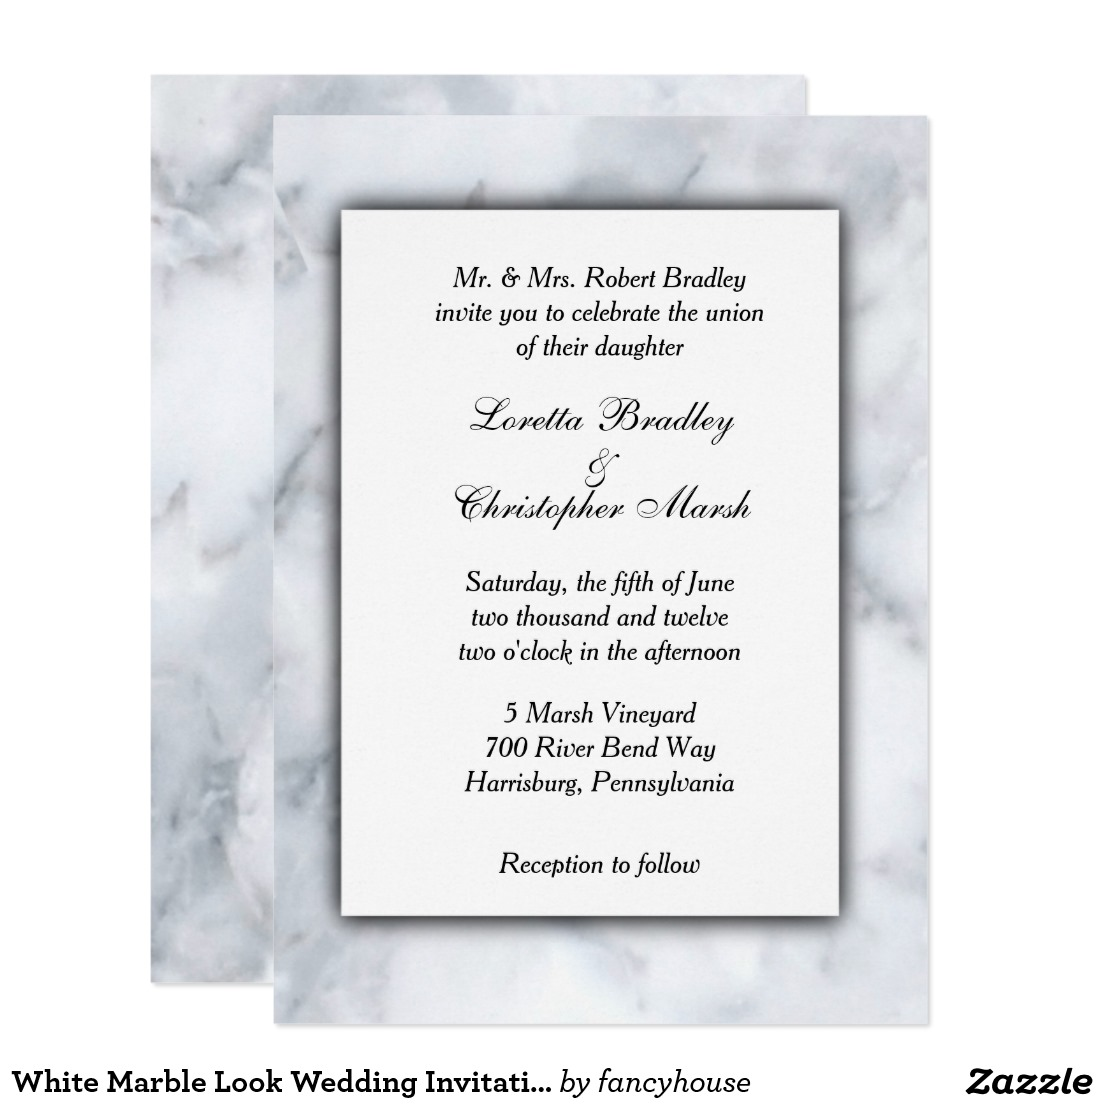 White Marble Look Wedding Invitation   Zazzle   Home